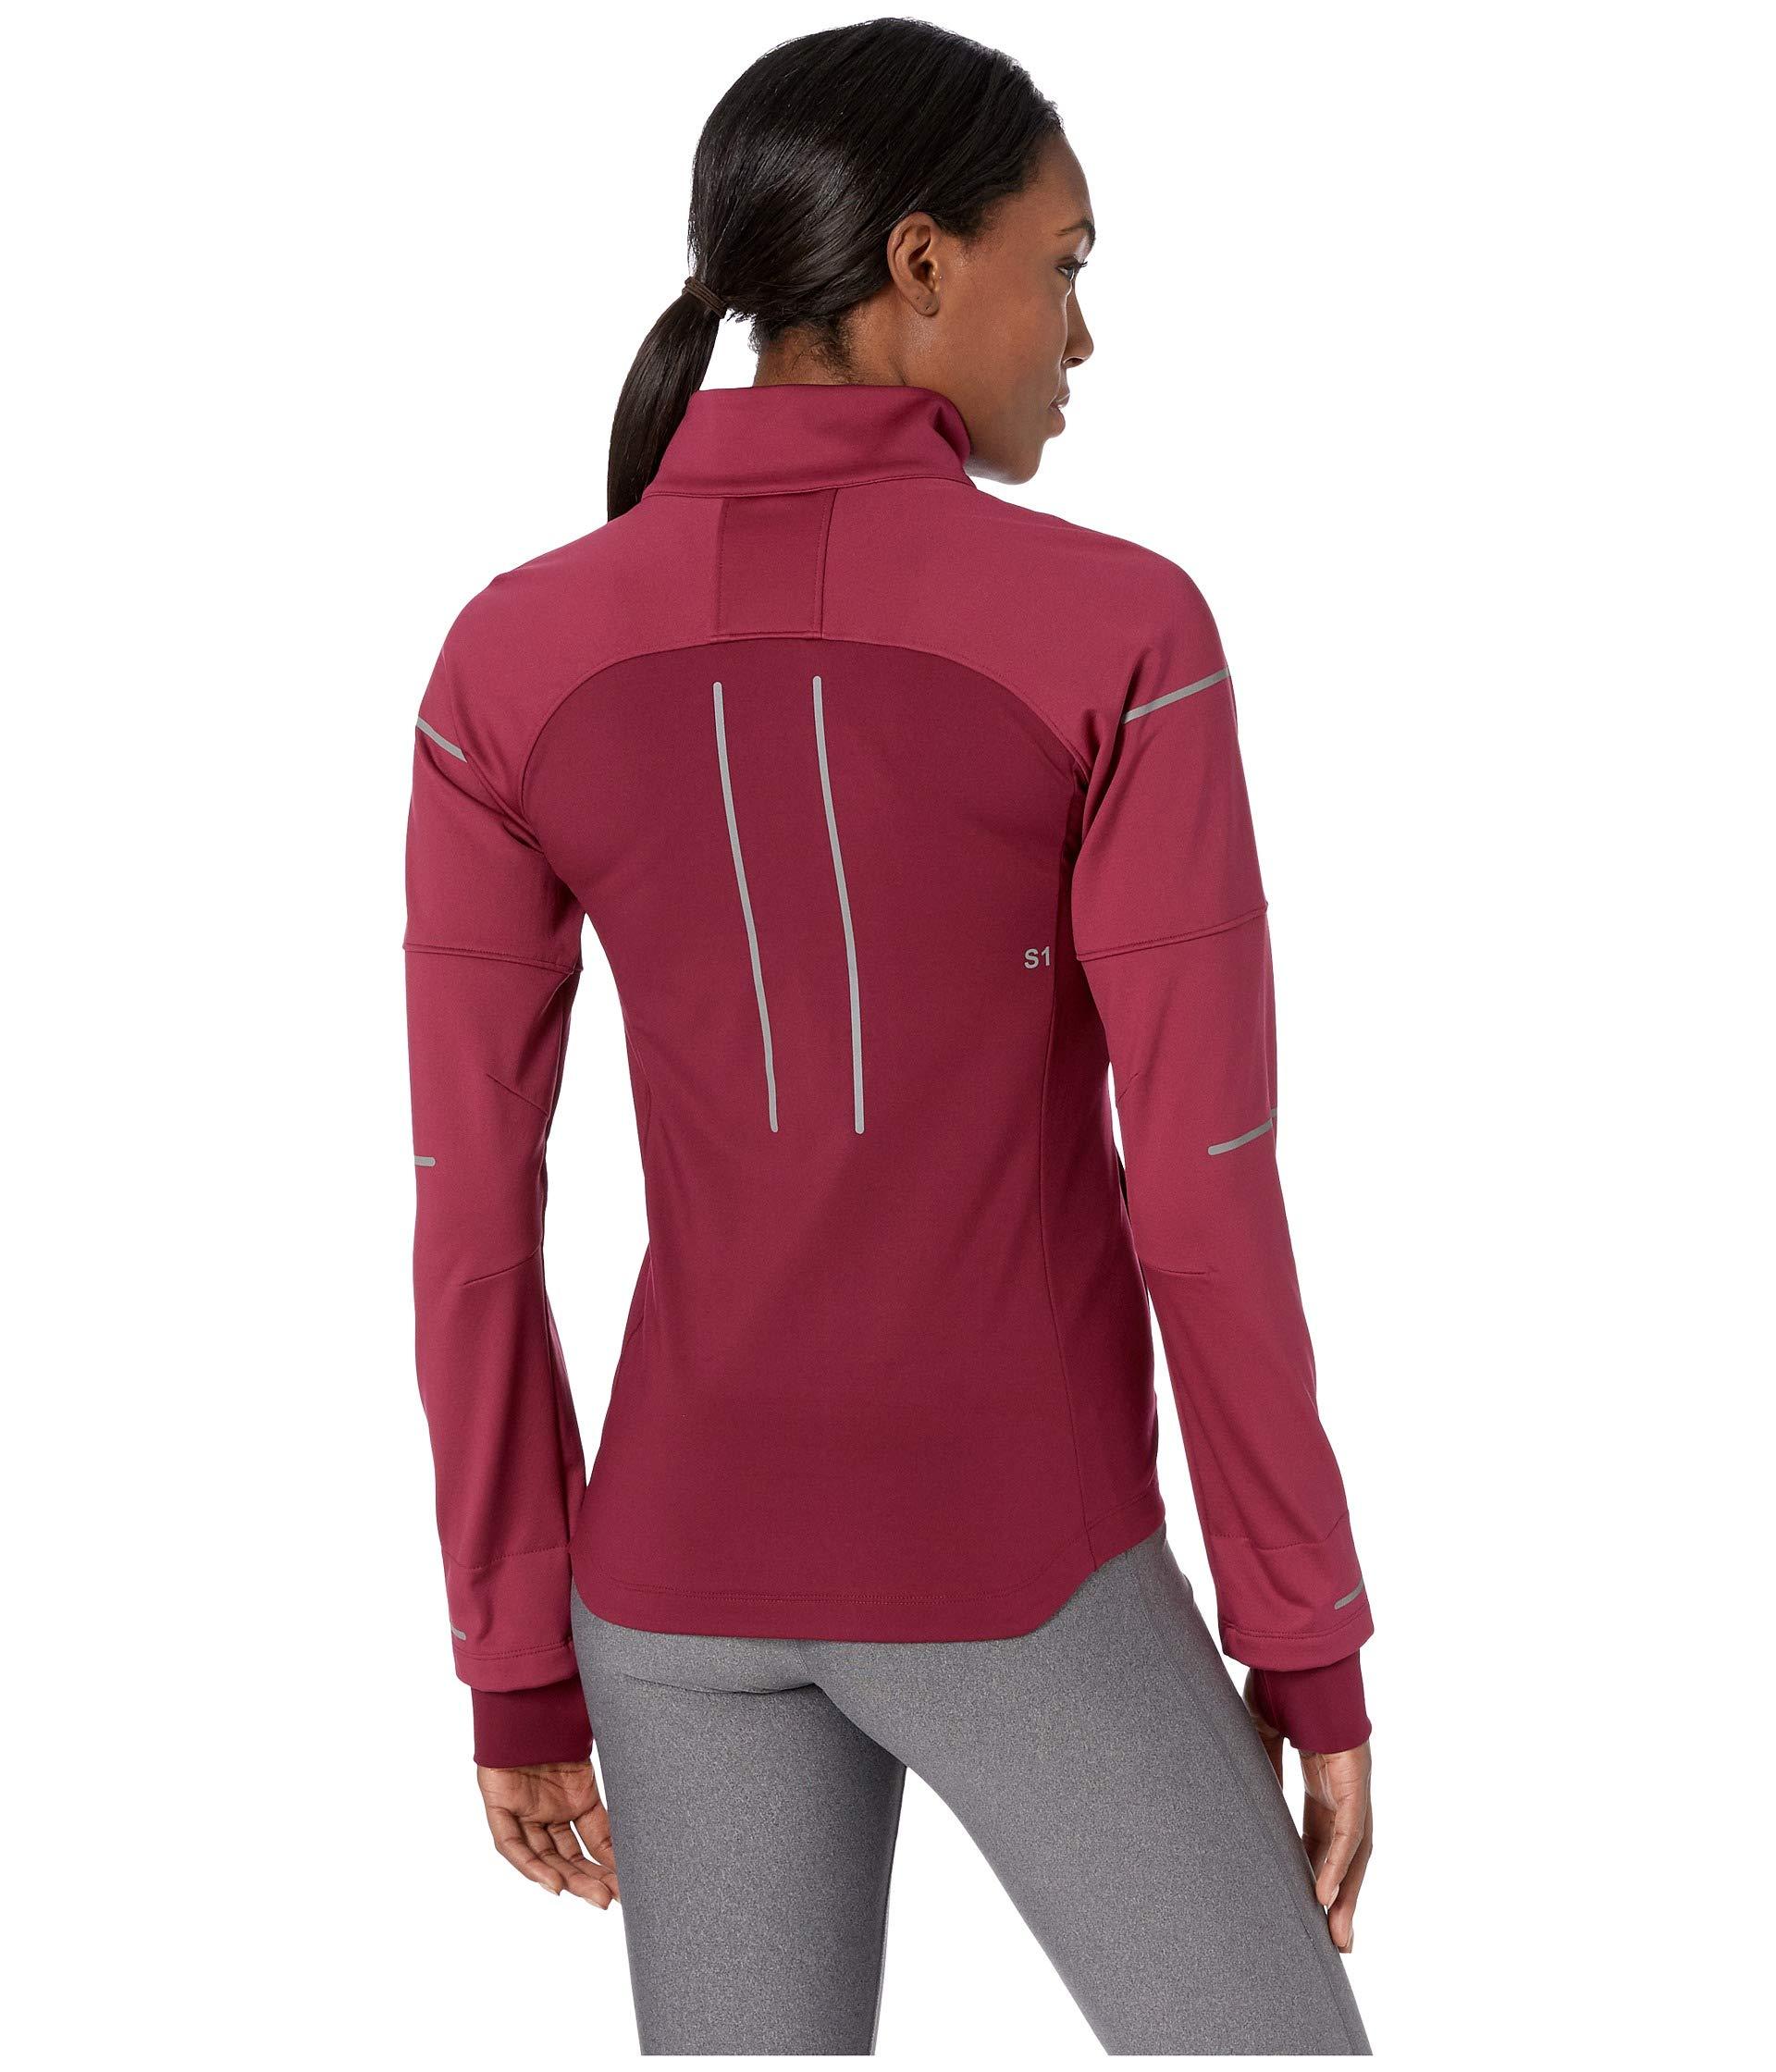 ASICS Lite-Show Winter Jacket, X-Small, Cordvan by ASICS (Image #4)